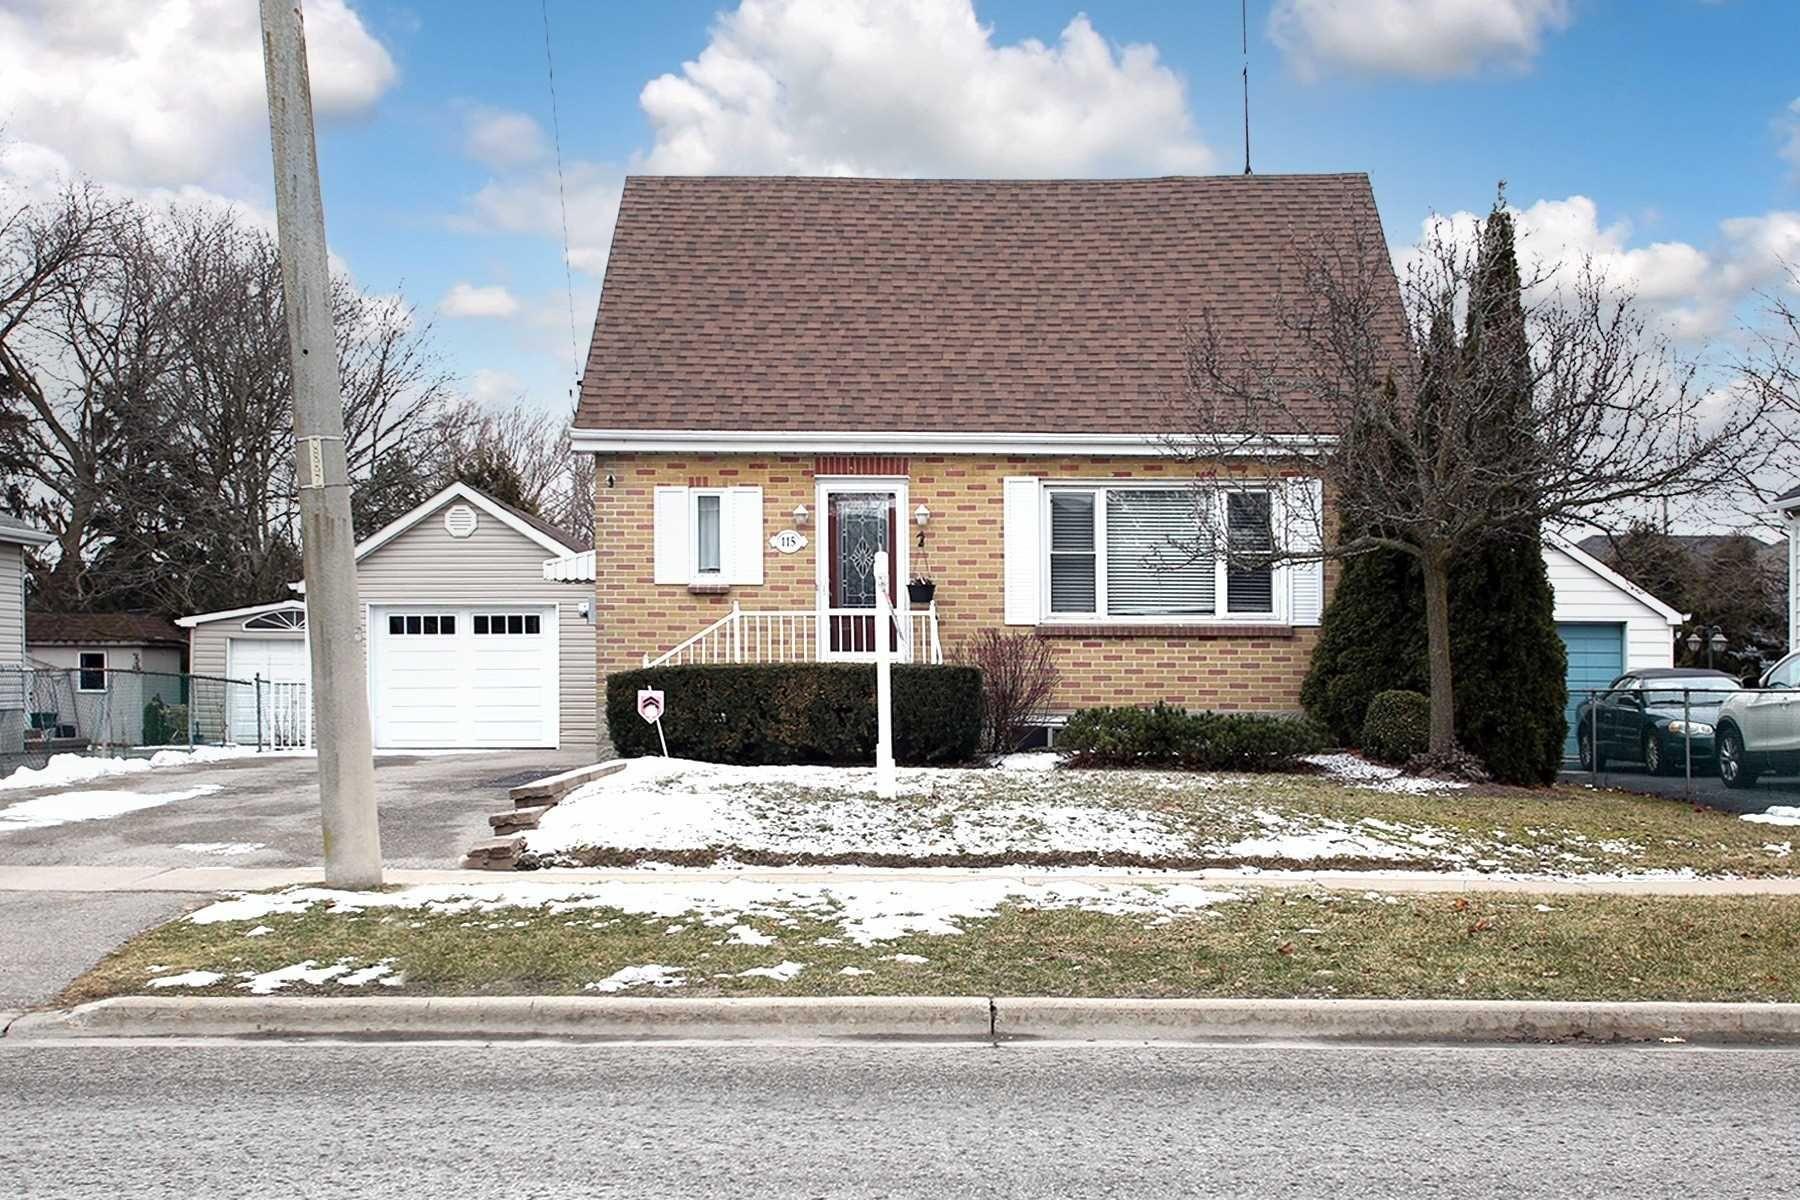 Main Photo: 115 W Beatrice Street in Oshawa: Centennial House (1 1/2 Storey) for sale : MLS®# E5103401